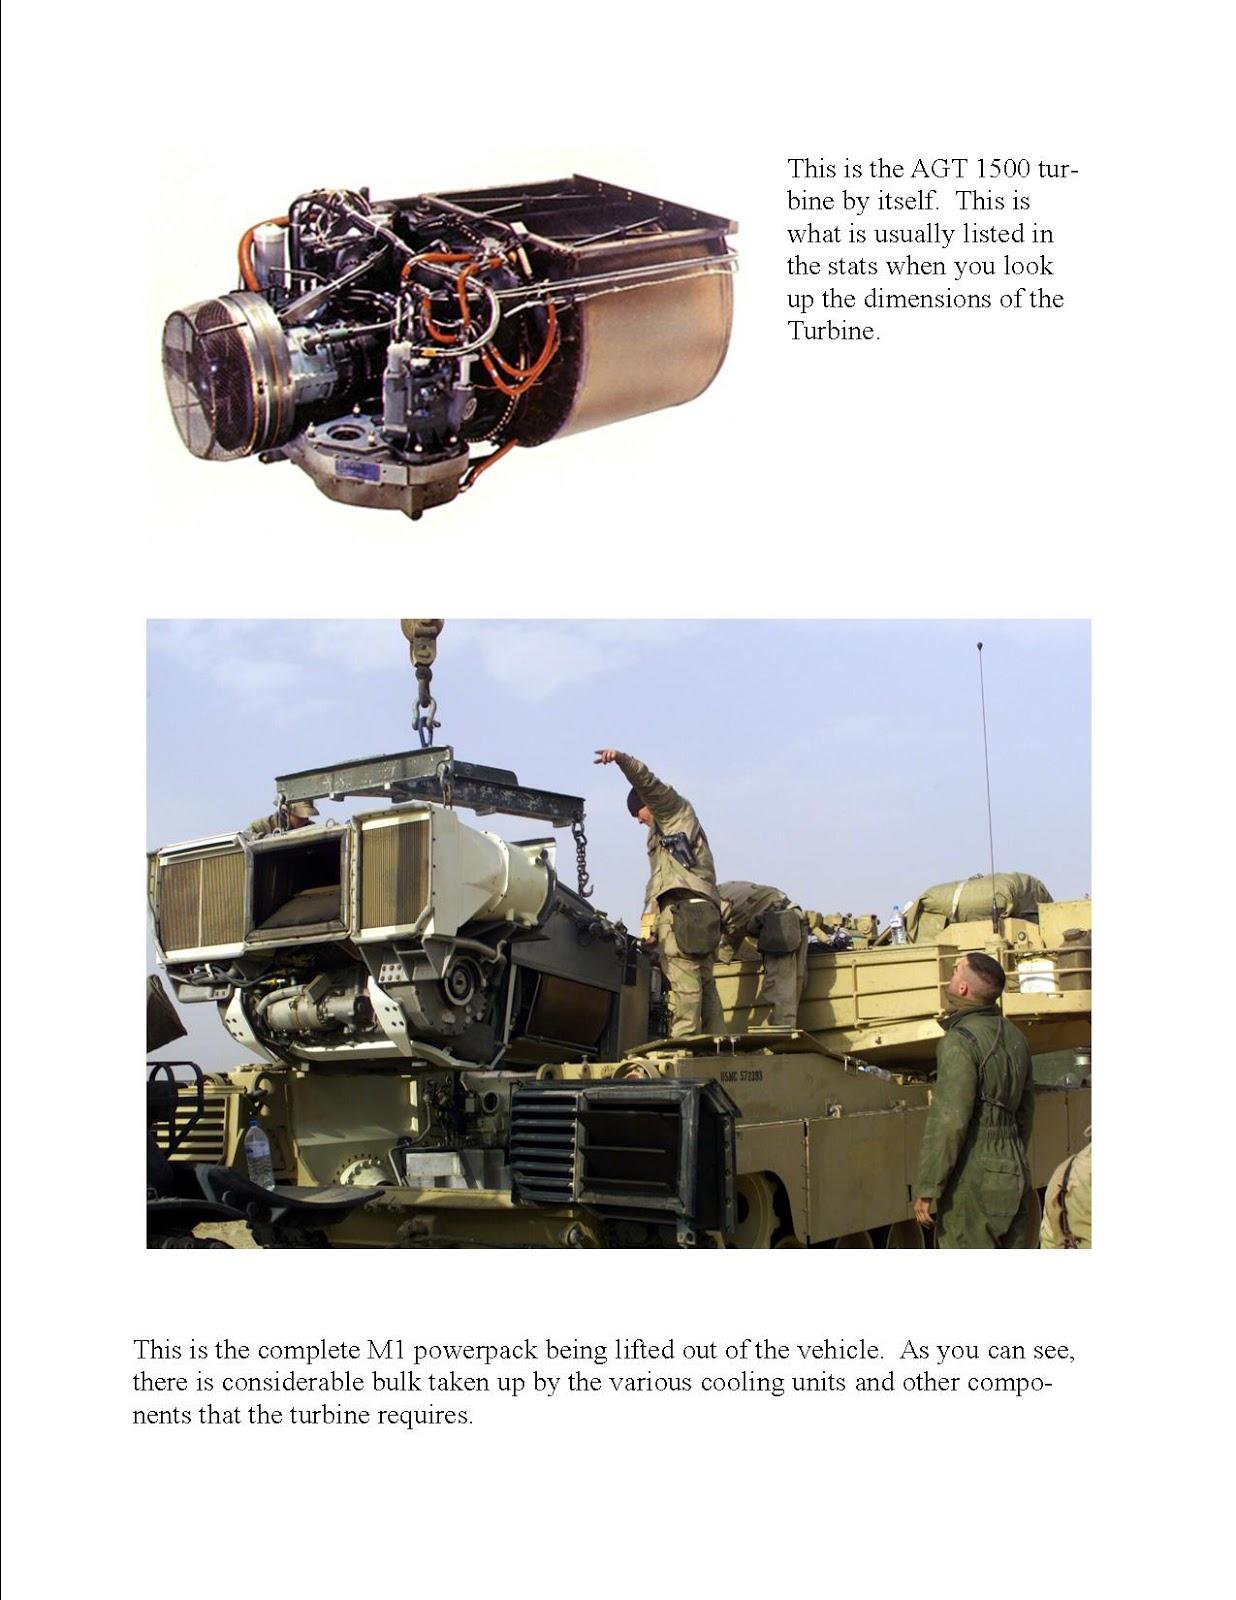 LV 100 5 Turbine Engine Armored Vehicle History World of Tanks